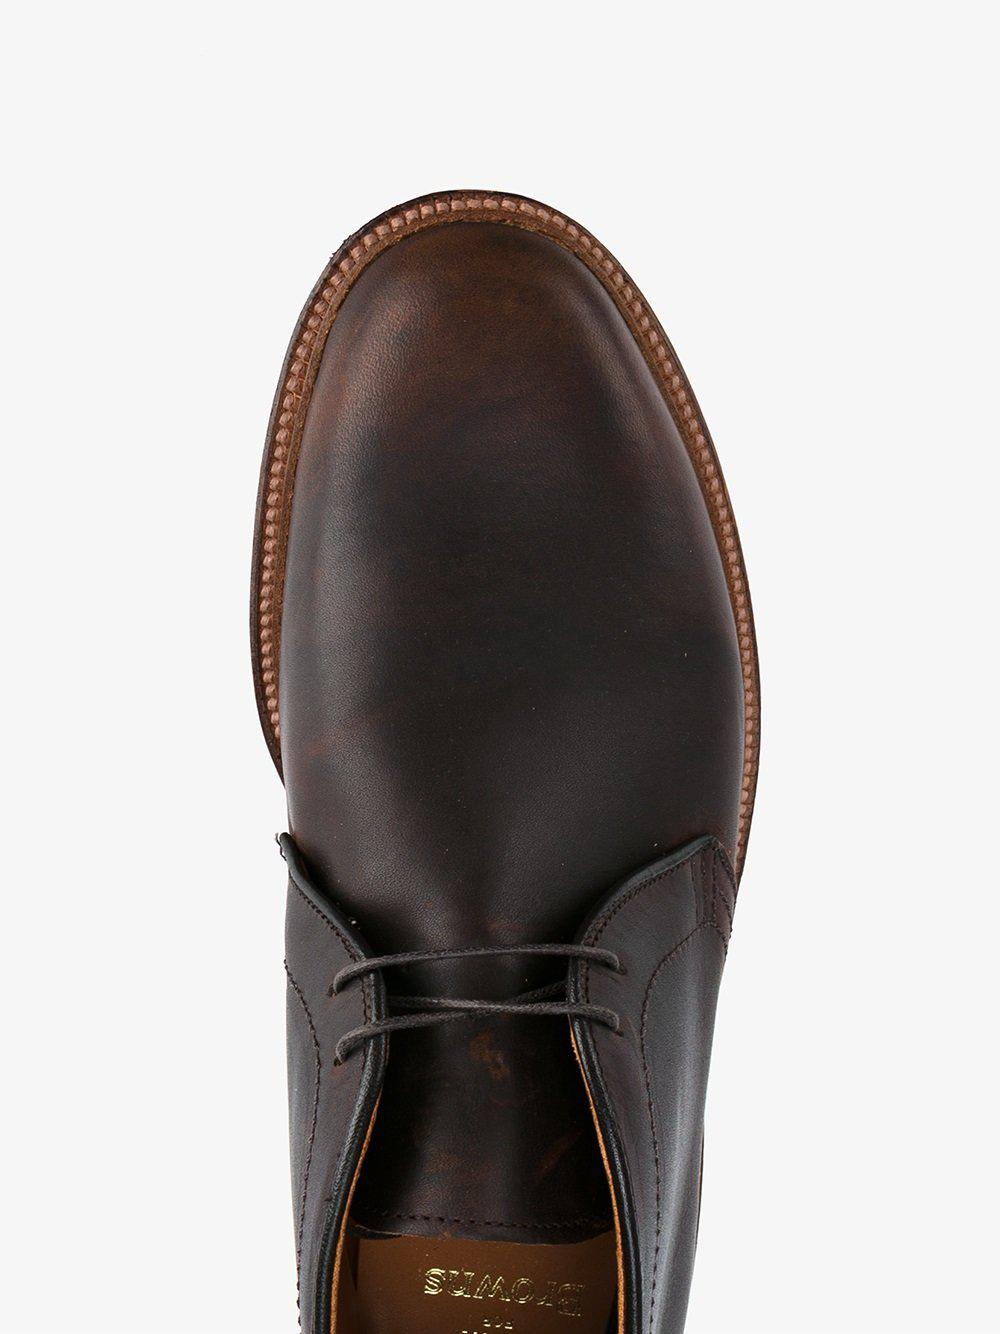 Alden Chukka Leather Boots In Dark Brown Brown For Men